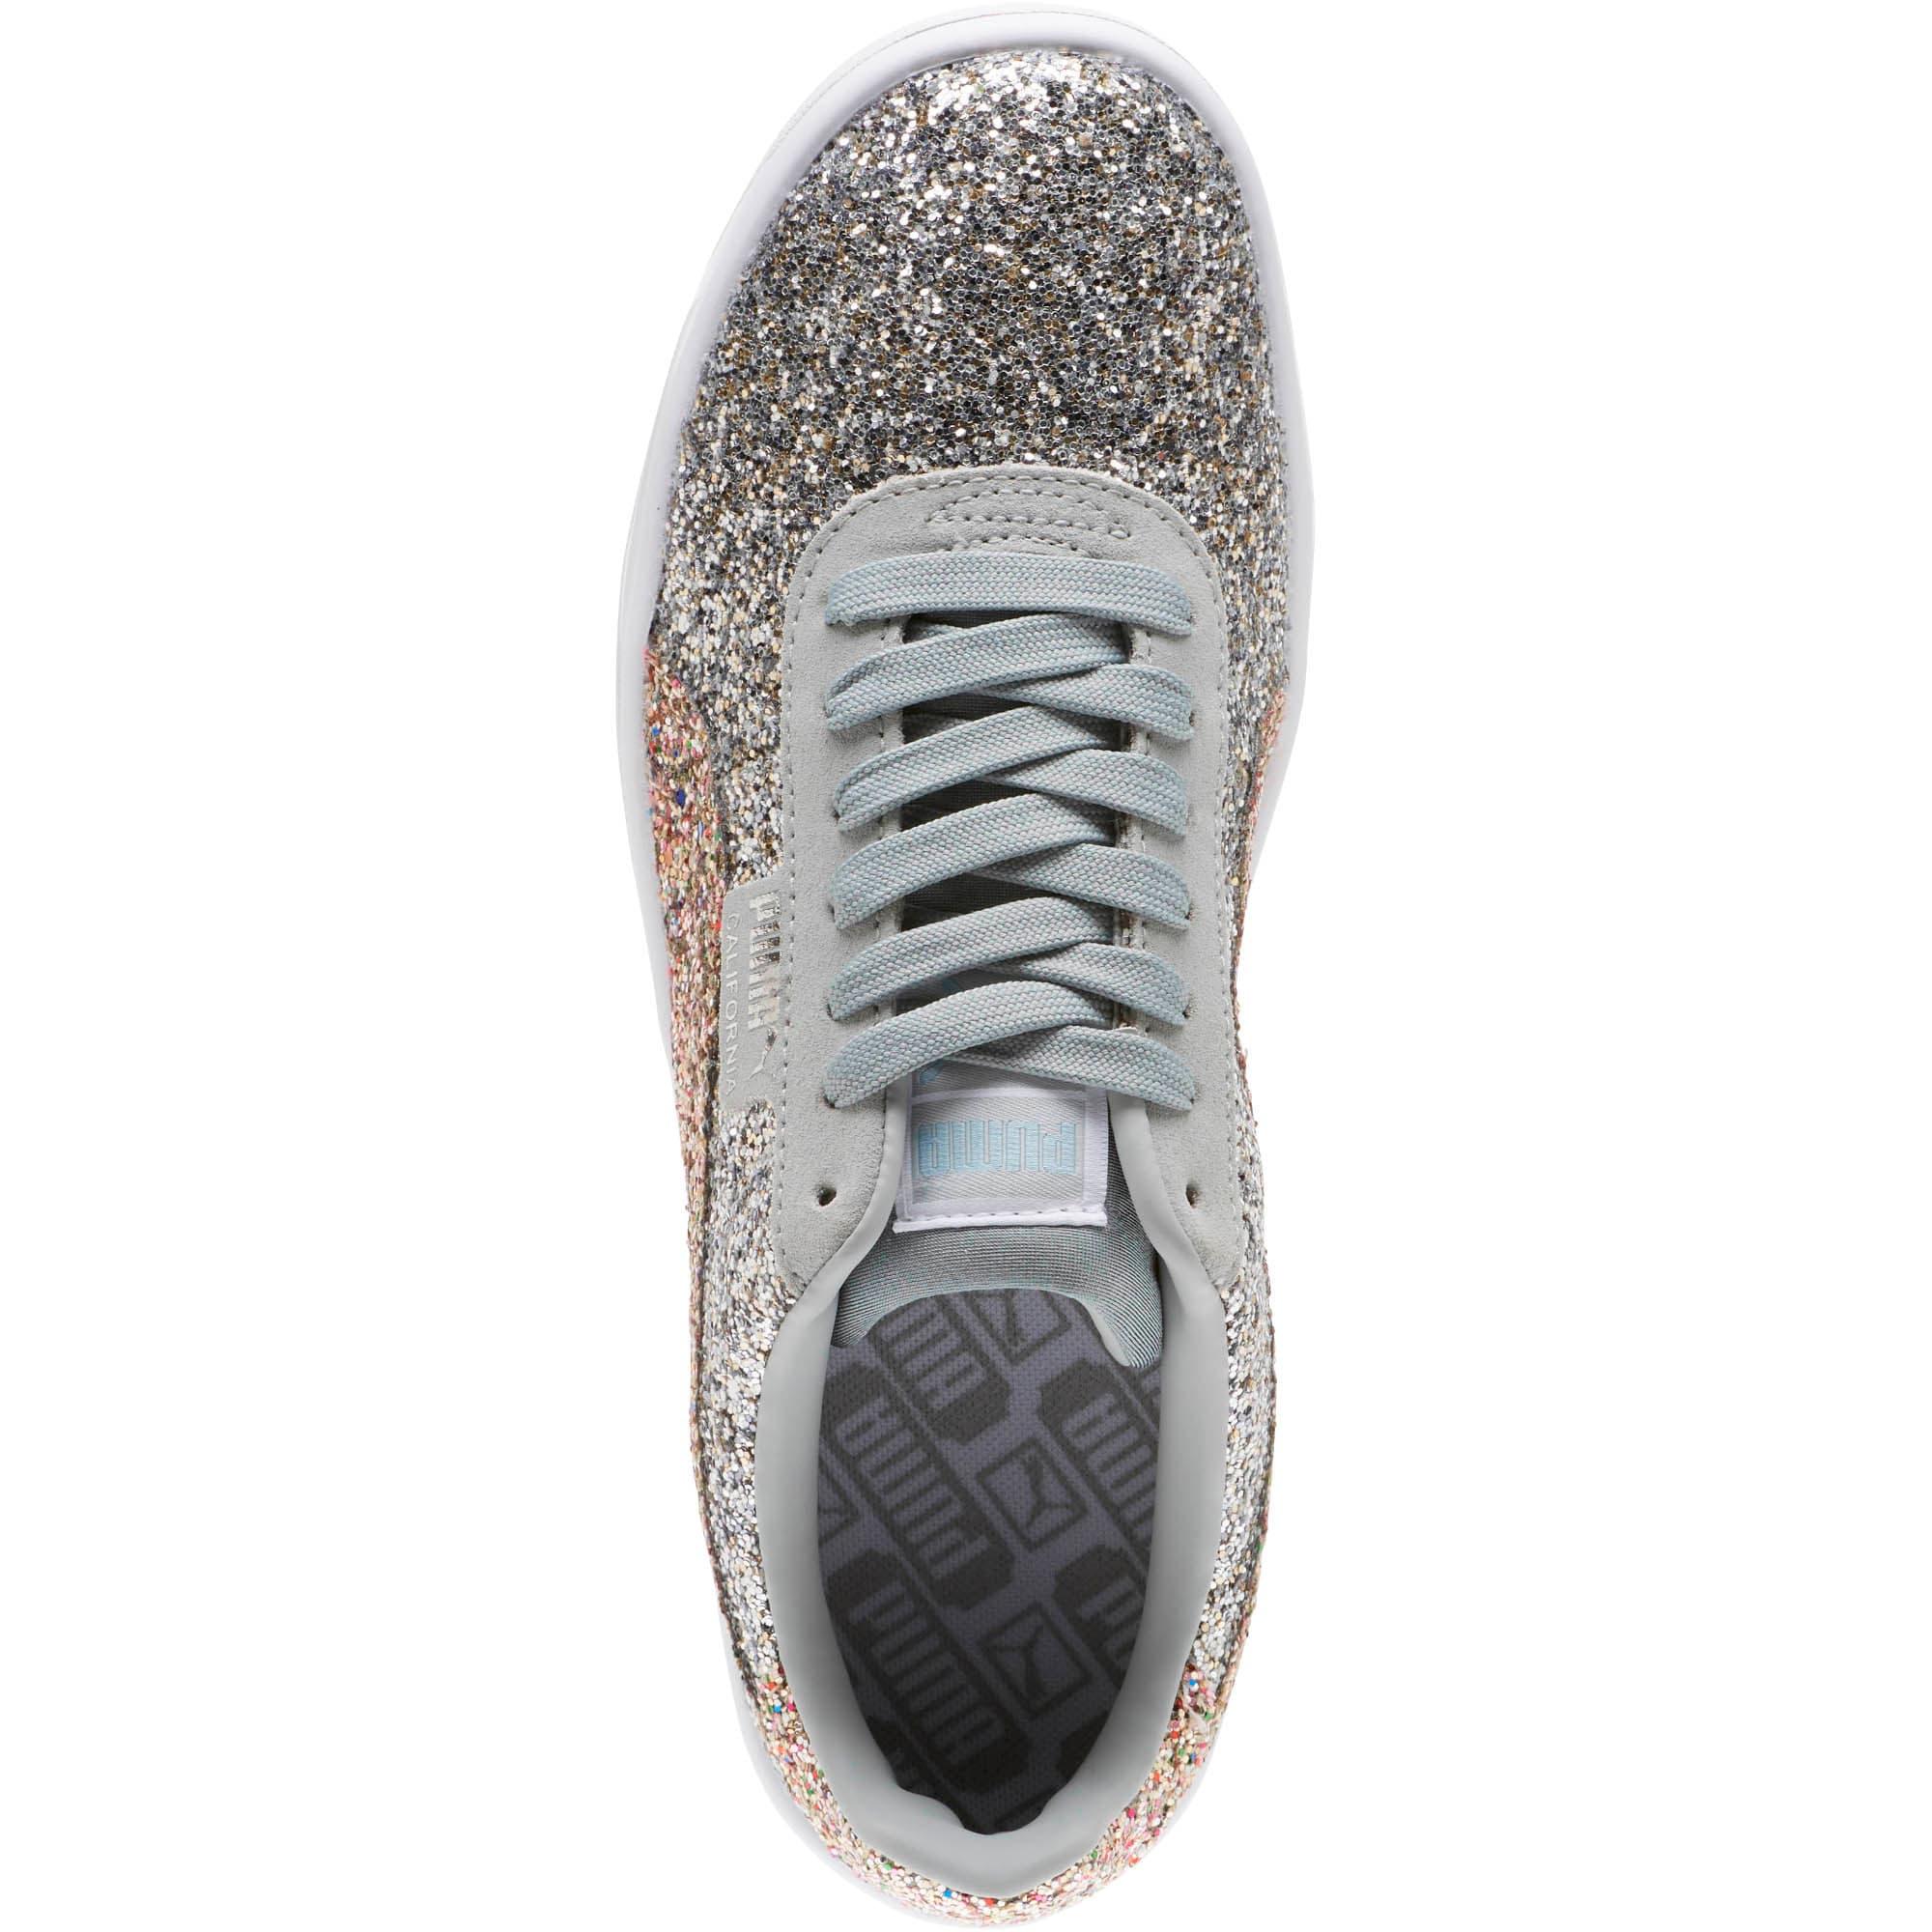 Thumbnail 5 of California Glitz Women's Sneakers, Silver-CERULEAN-Quarry, medium